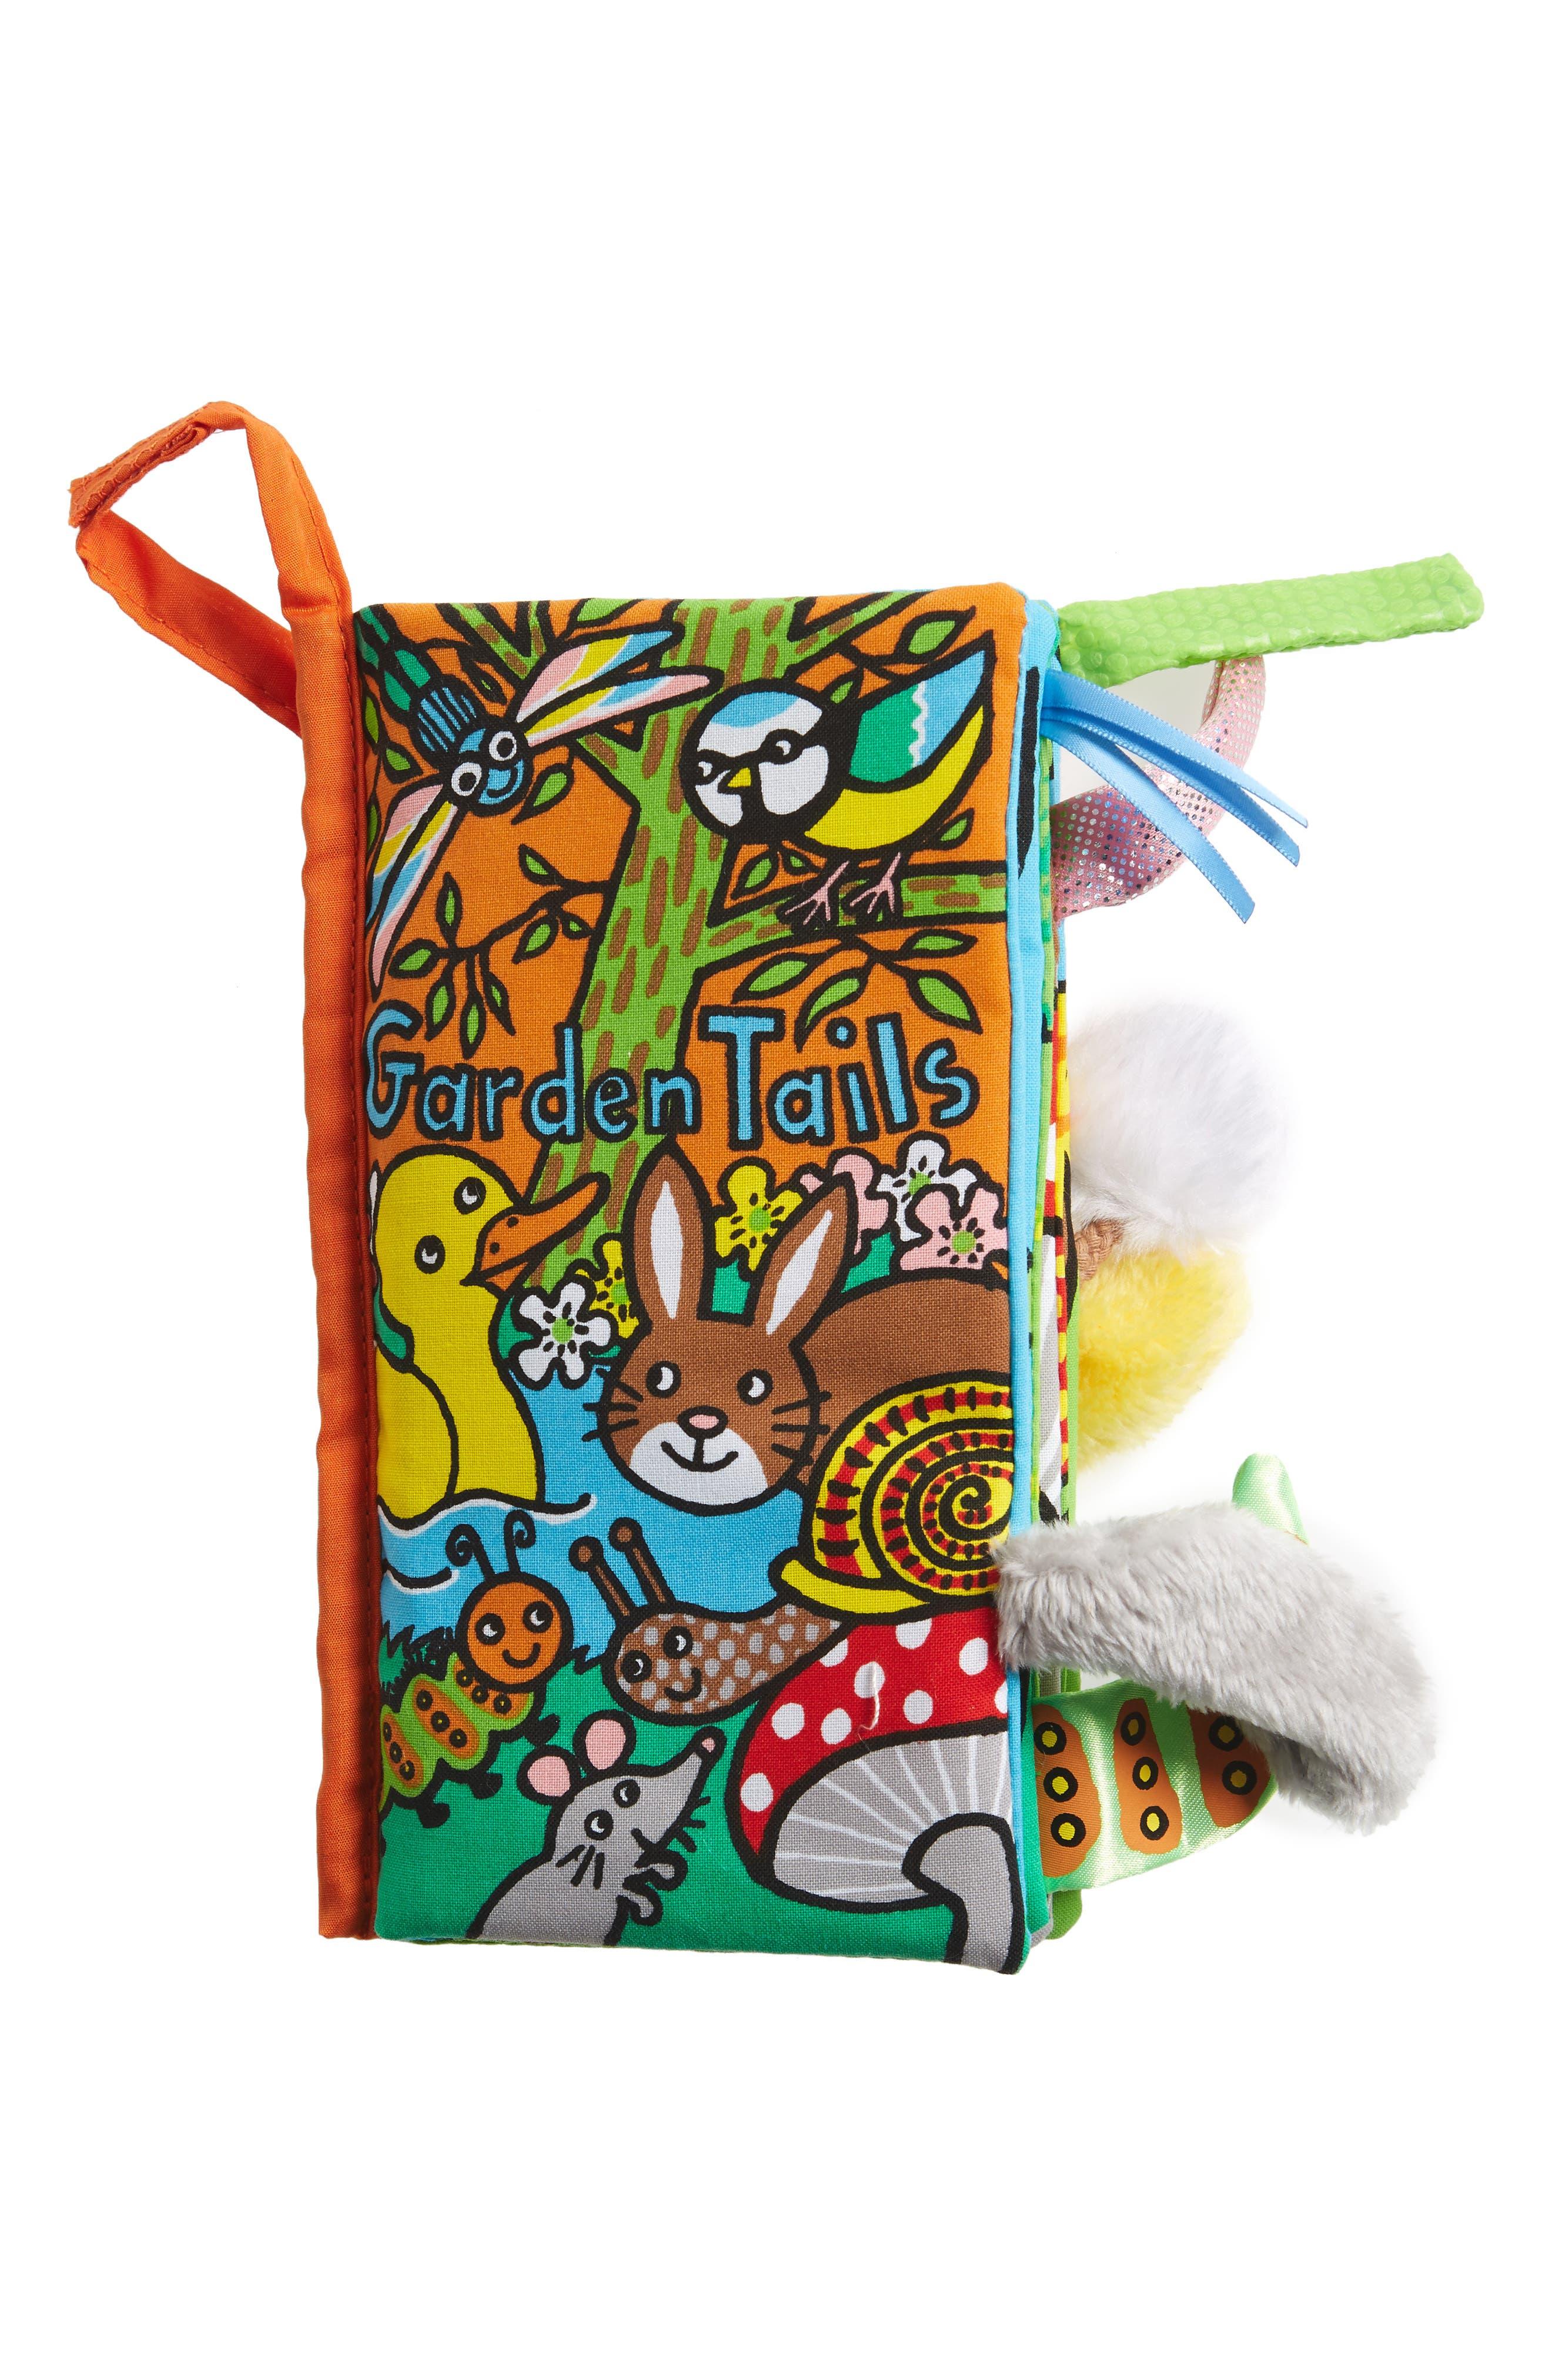 JELLYCAT Garden Tails Fabric Book